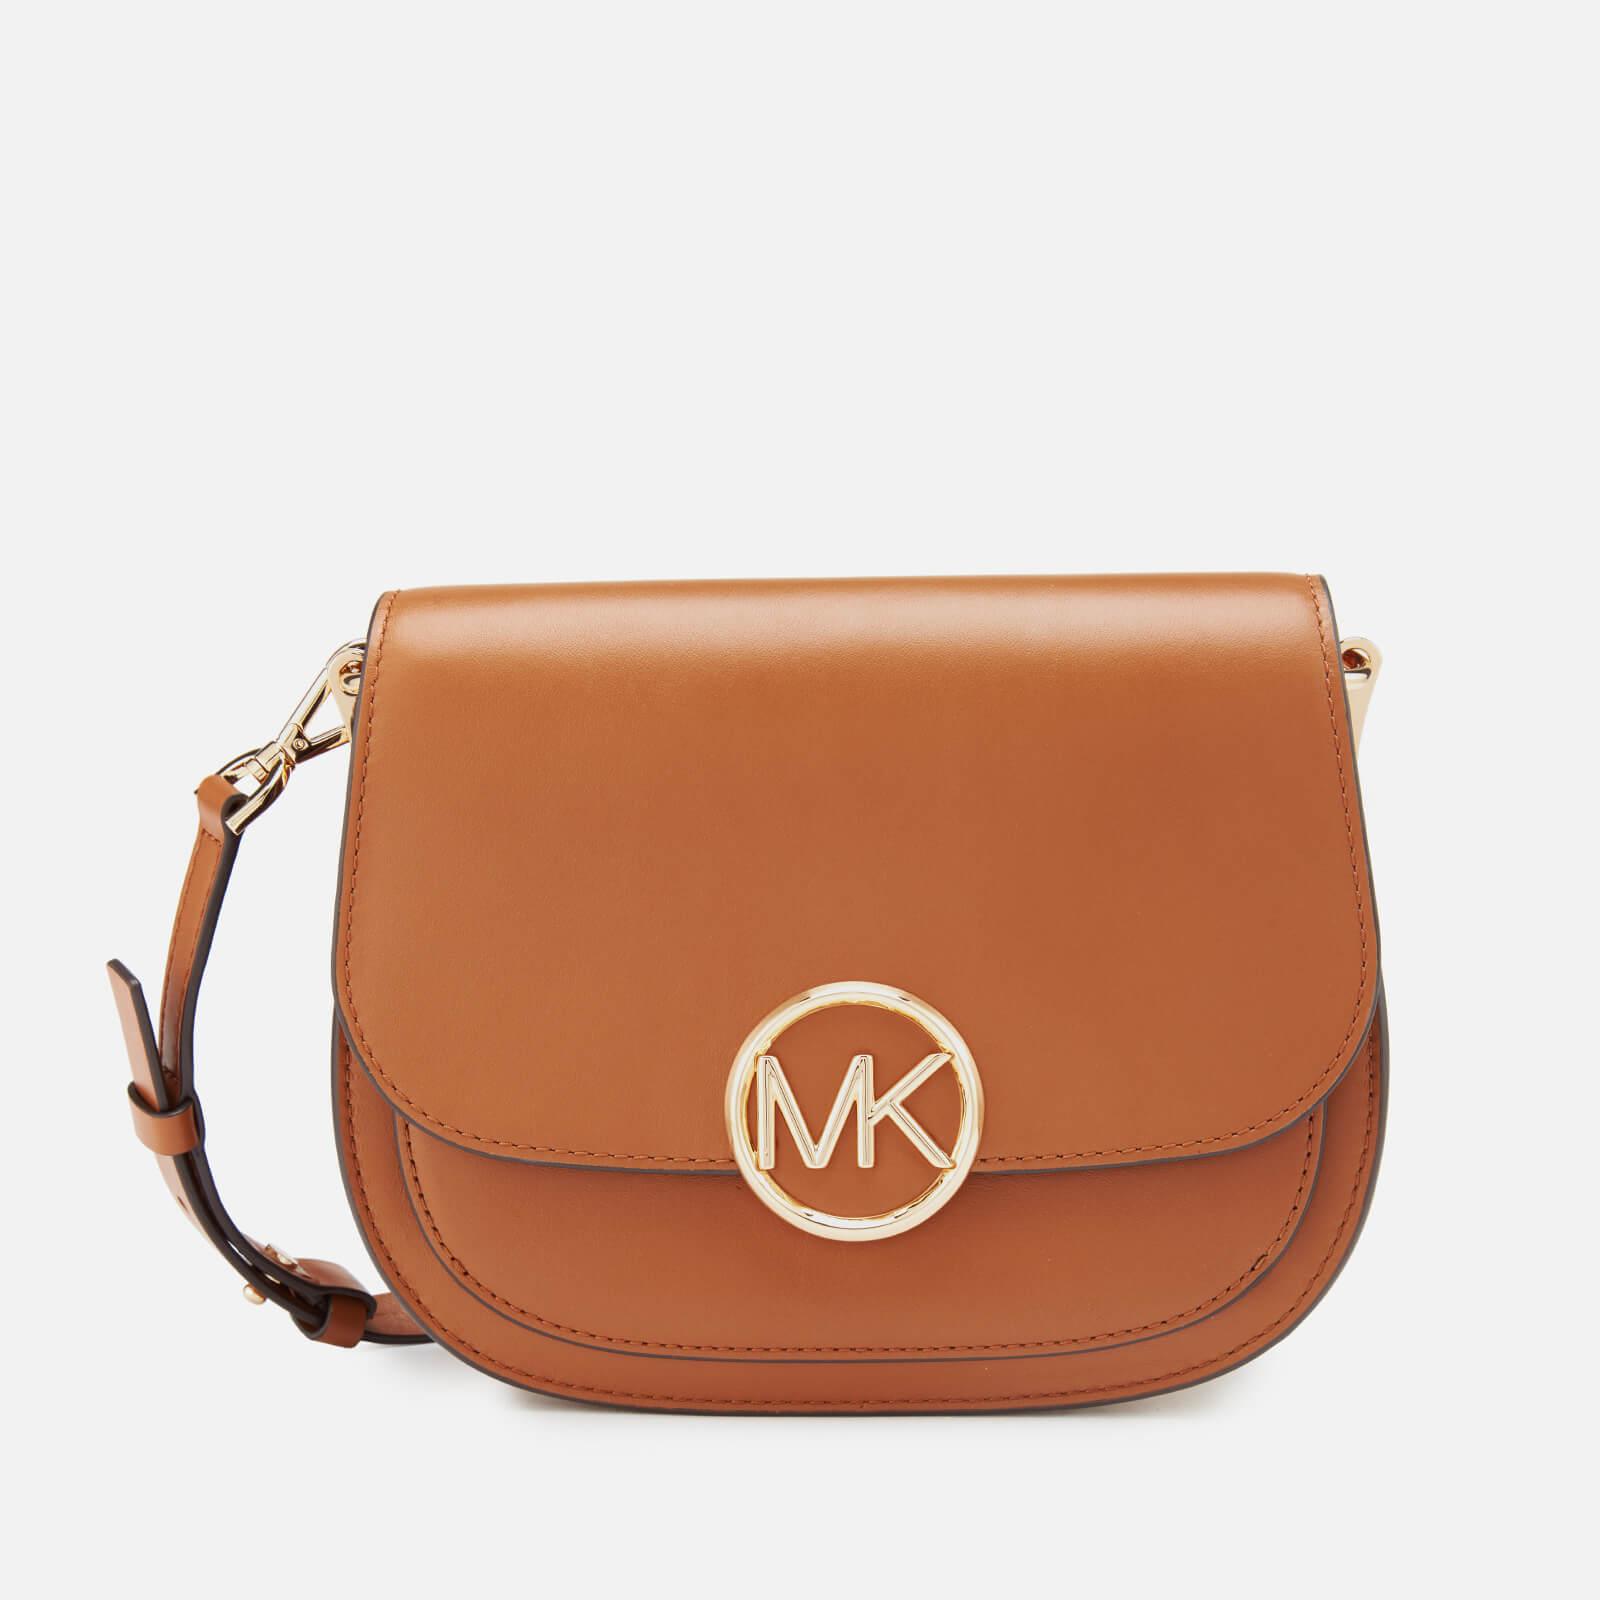 ddbbf6d29406 MICHAEL MICHAEL KORS Women s Lillie Medium Saddle Messenger Bag - Acorn -  Free UK Delivery over £50